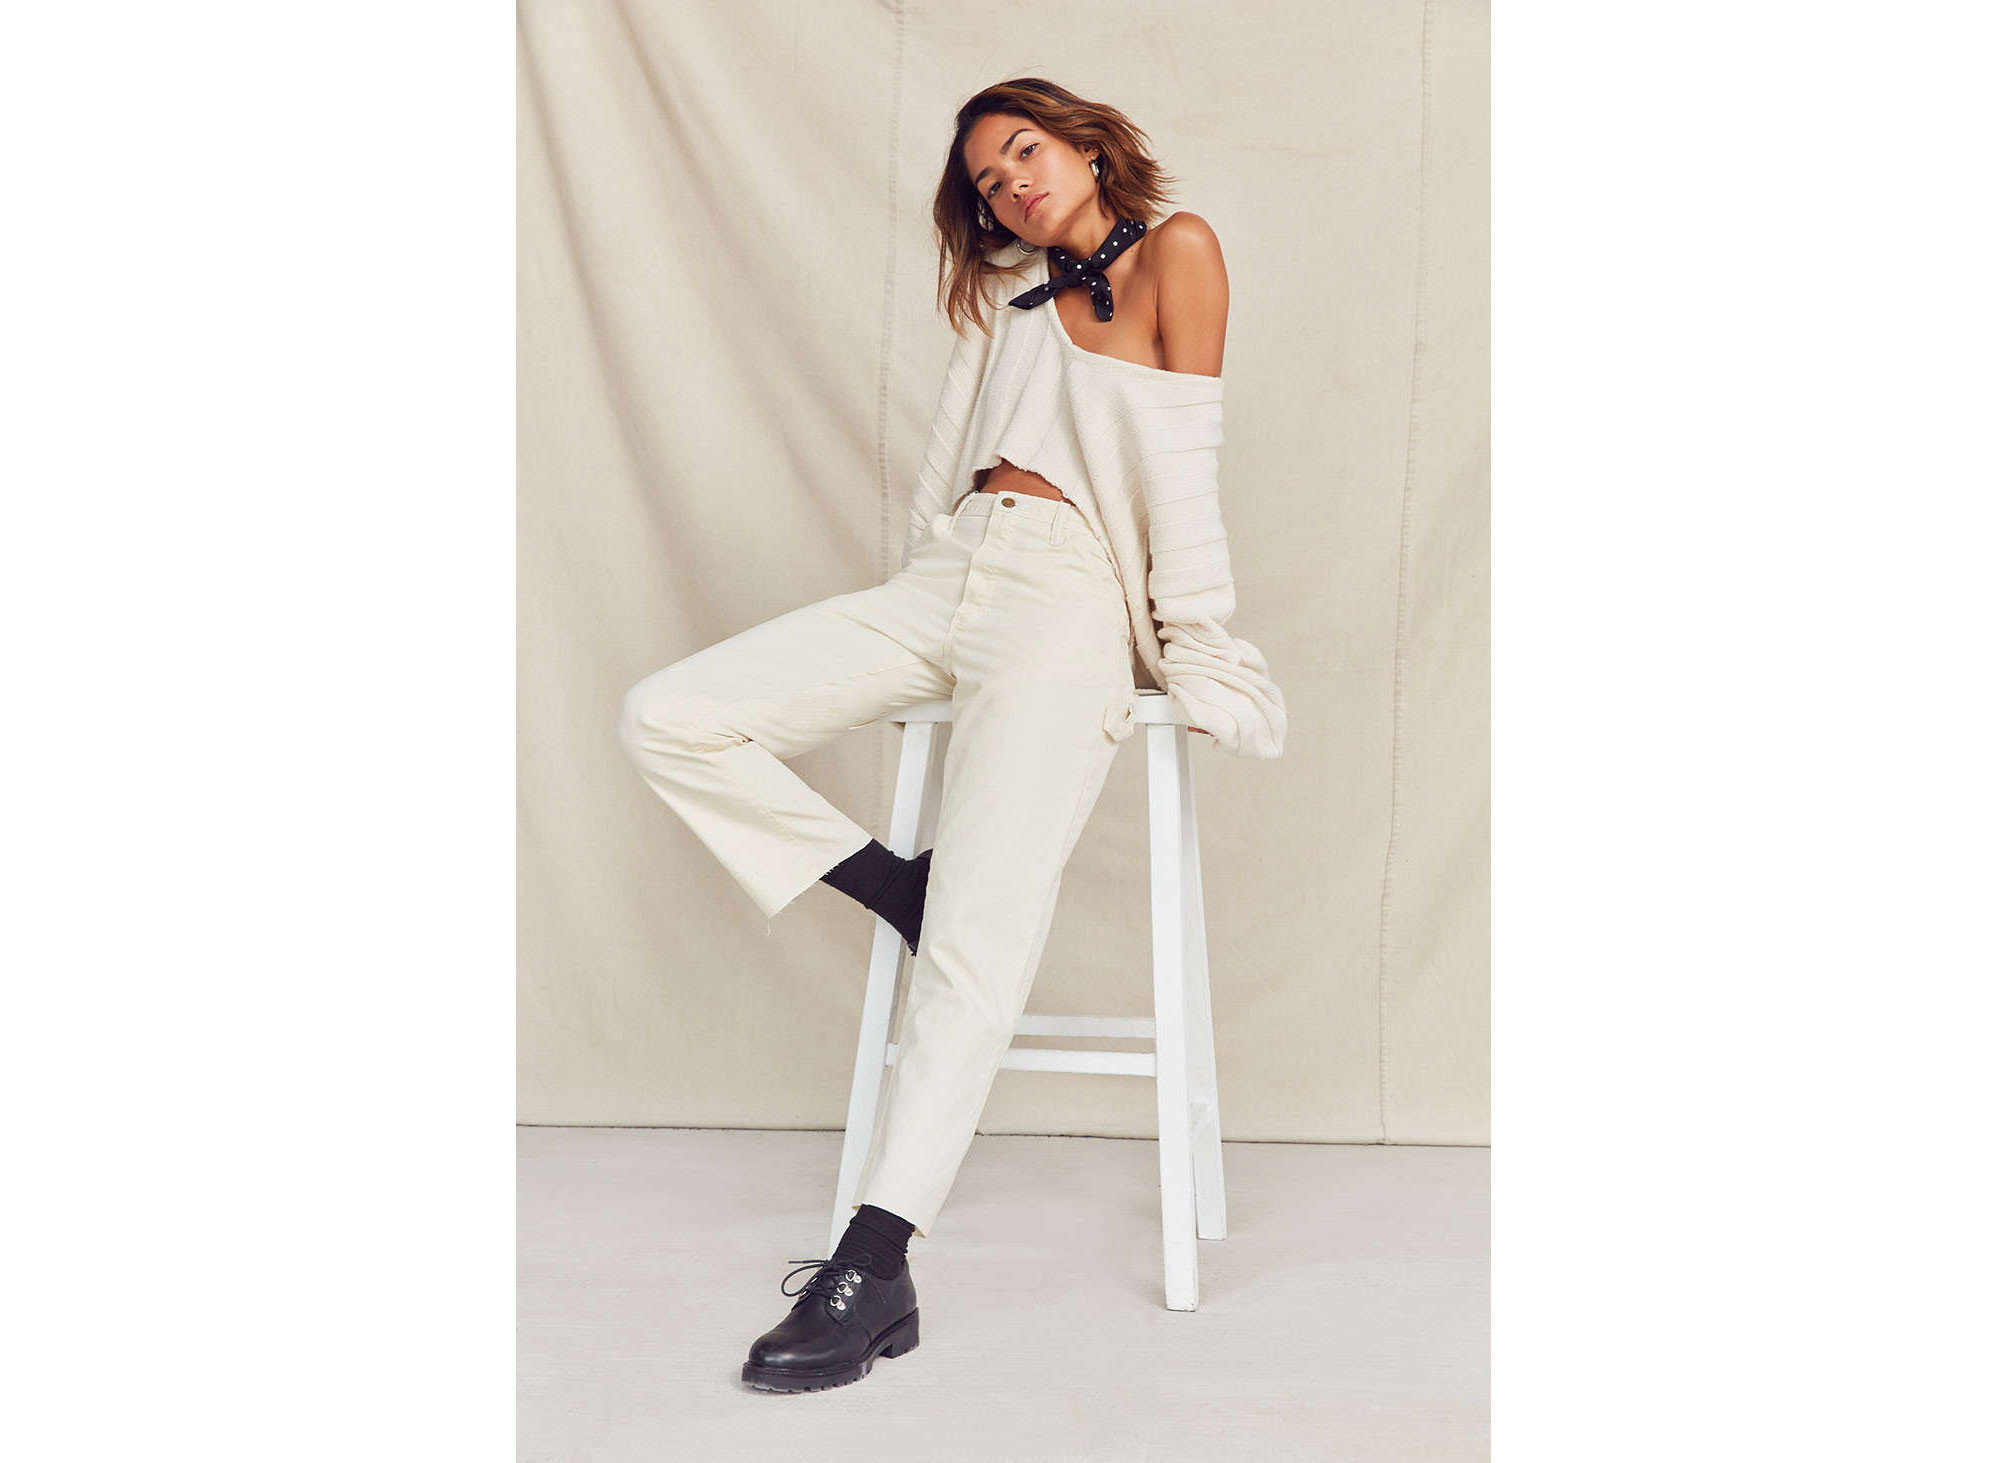 Travel Shop Travel Trends white person clothing fashion model shoulder joint waist trunk abdomen costume trousers neck shoe posing trouser